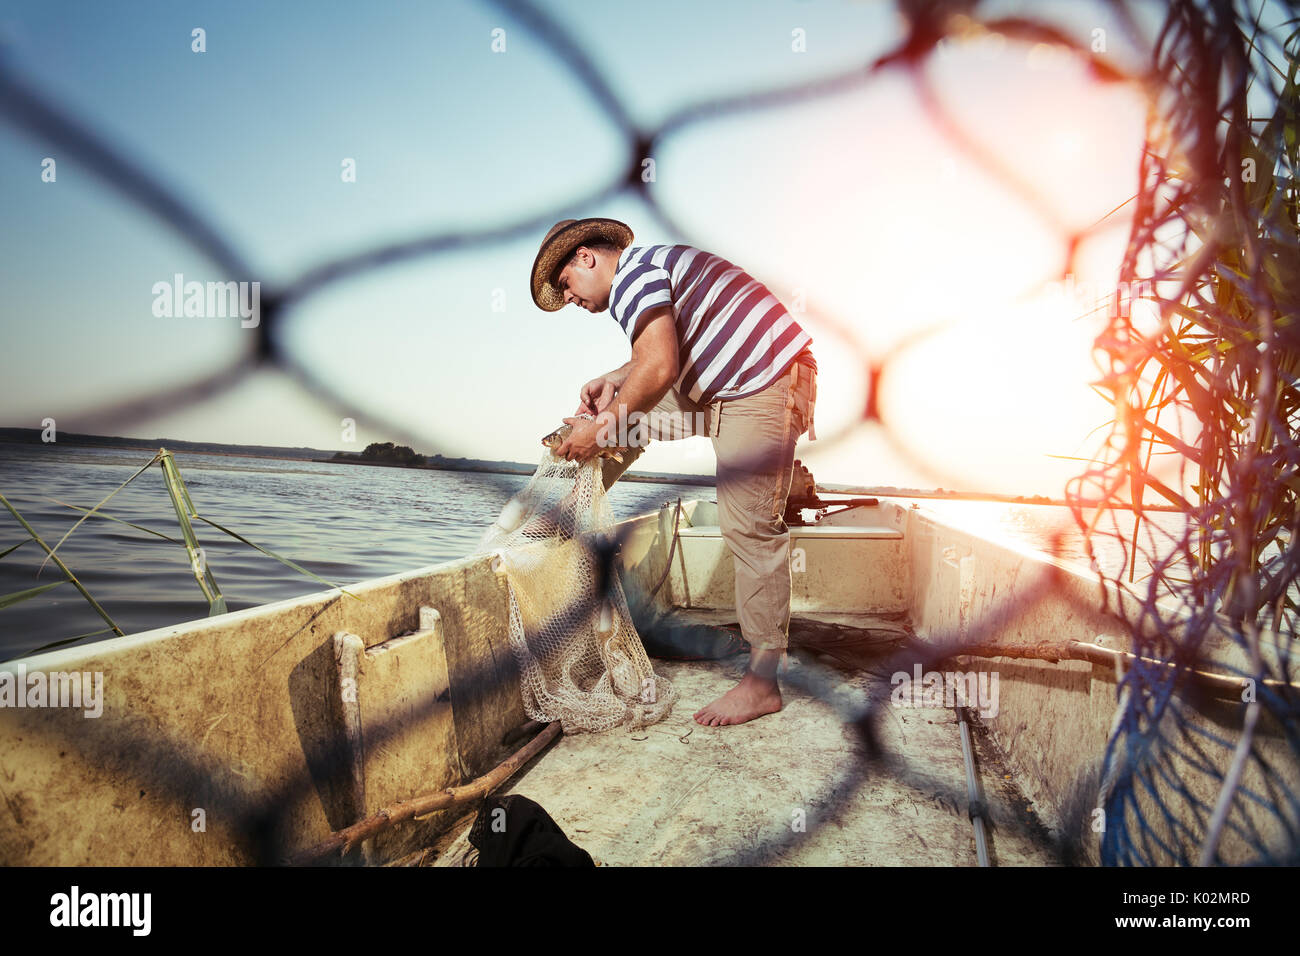 Fisherman fishing in the boat Stock Photo